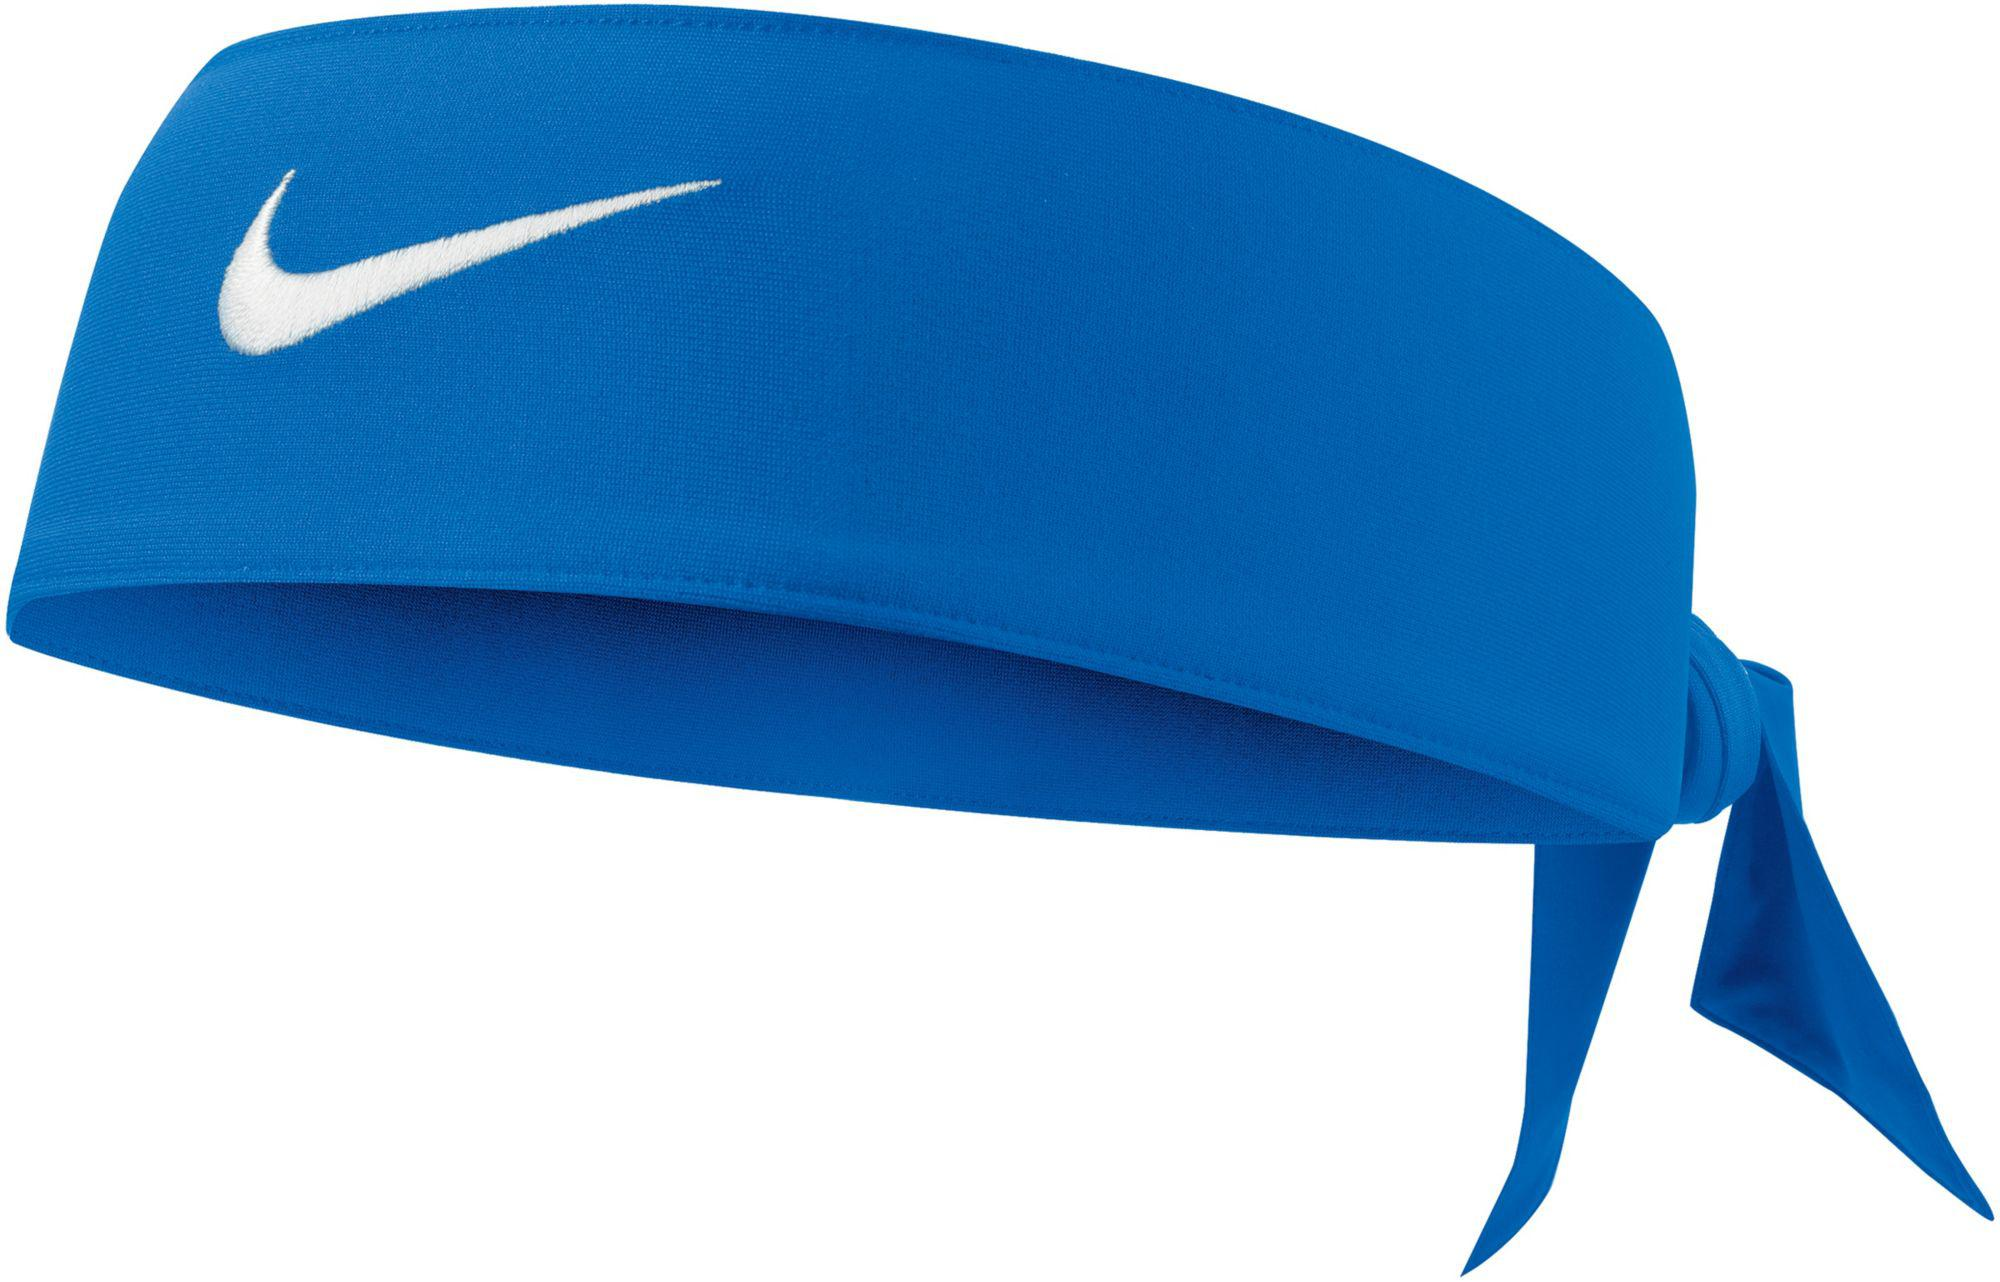 21a81f4bfb1f Lyst - Nike Dri-fit Head Tie in Blue for Men